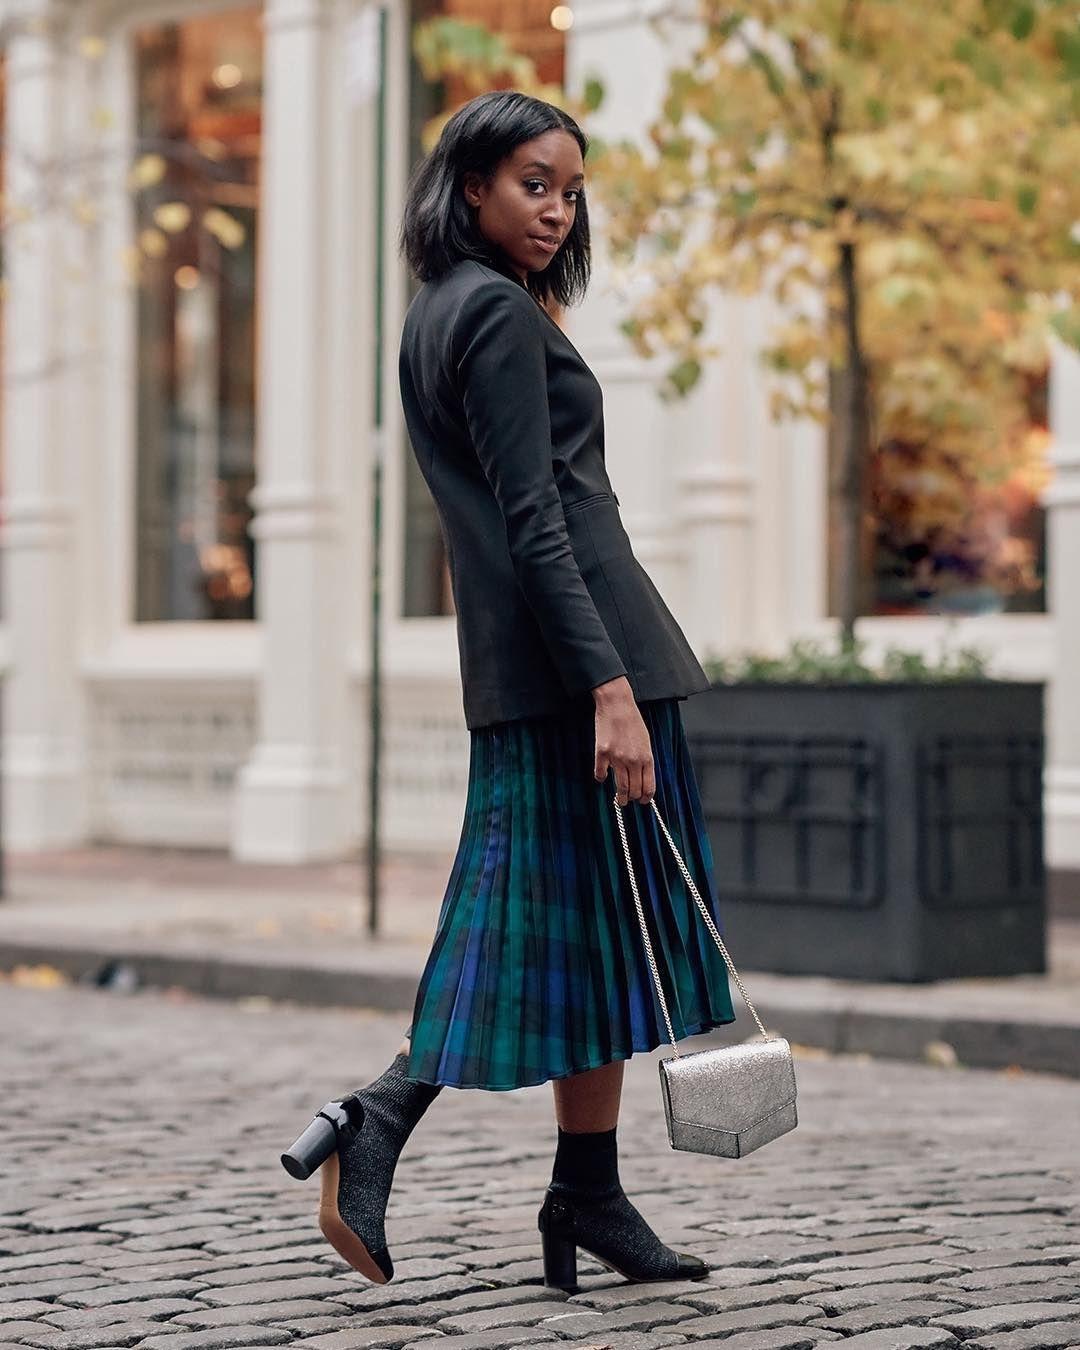 Vem Descobrir O Que Essa Palavra Dificil Significa Fashion Winter Engagement Photos Outfits Fashion People